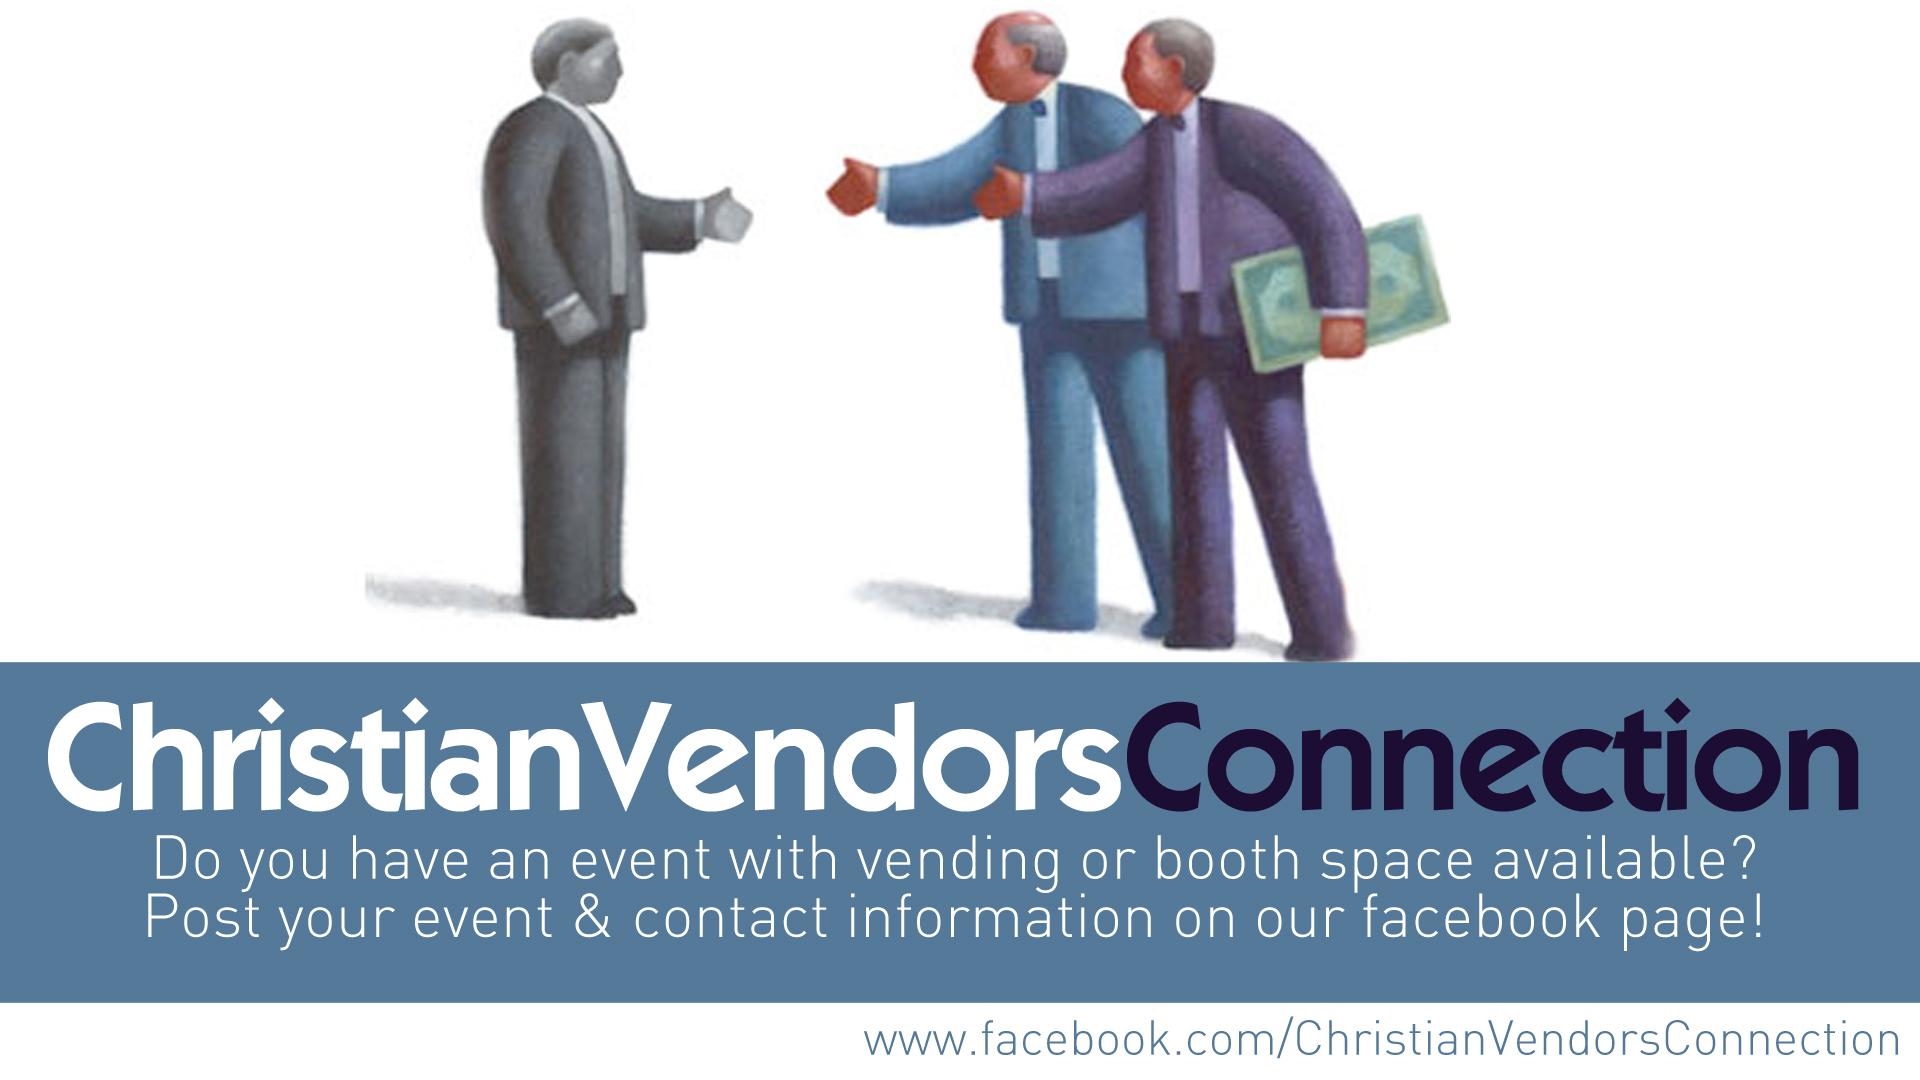 Christian Vendors Connection